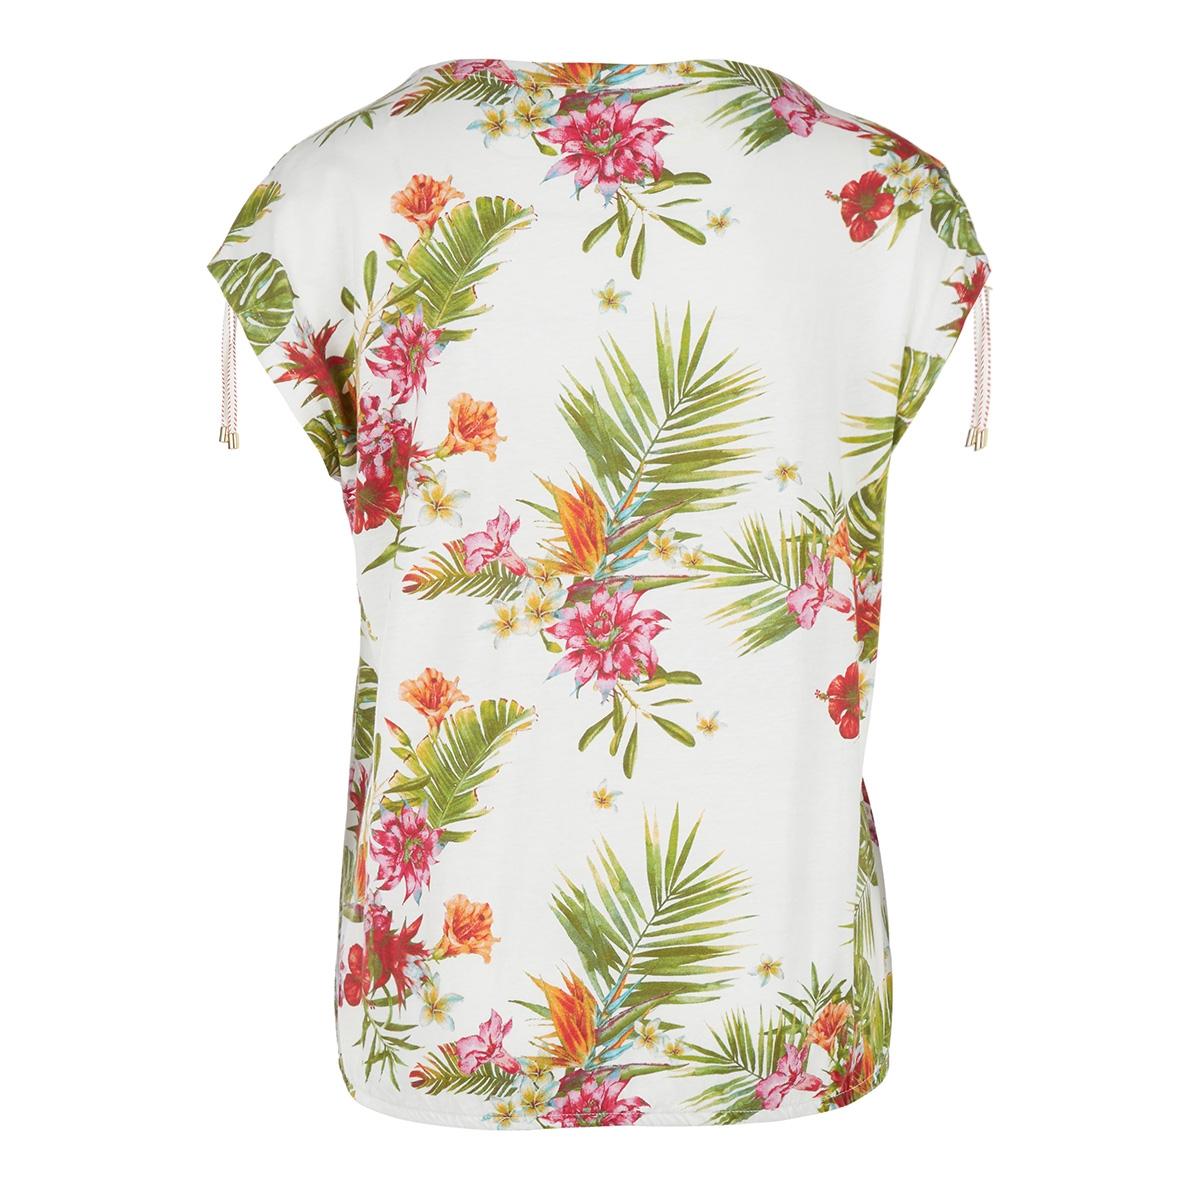 t shirt 04899325114 s.oliver t-shirt 02c8